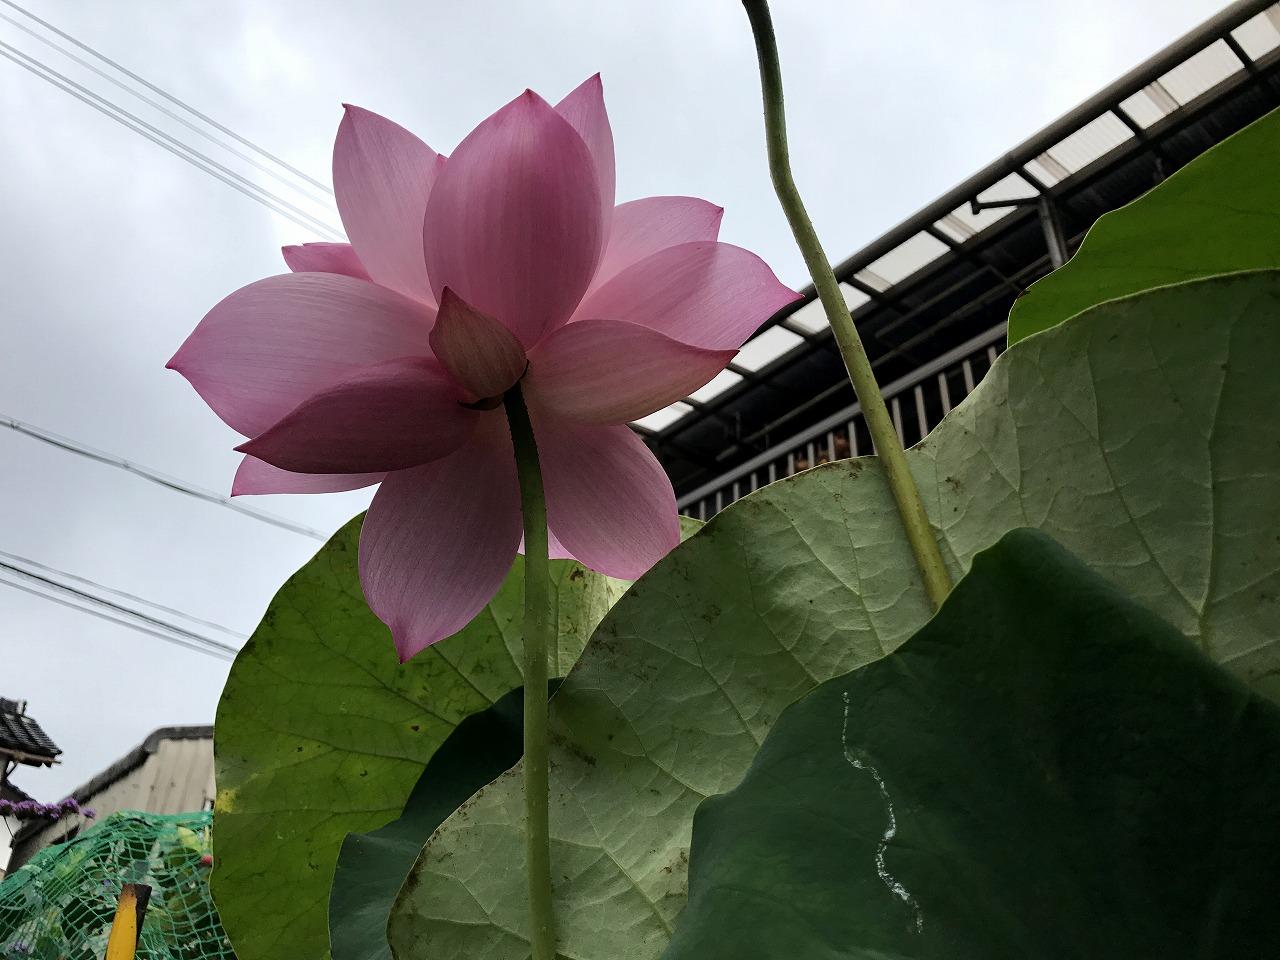 20170801-Lotus_Hishinkou-I03.jpg